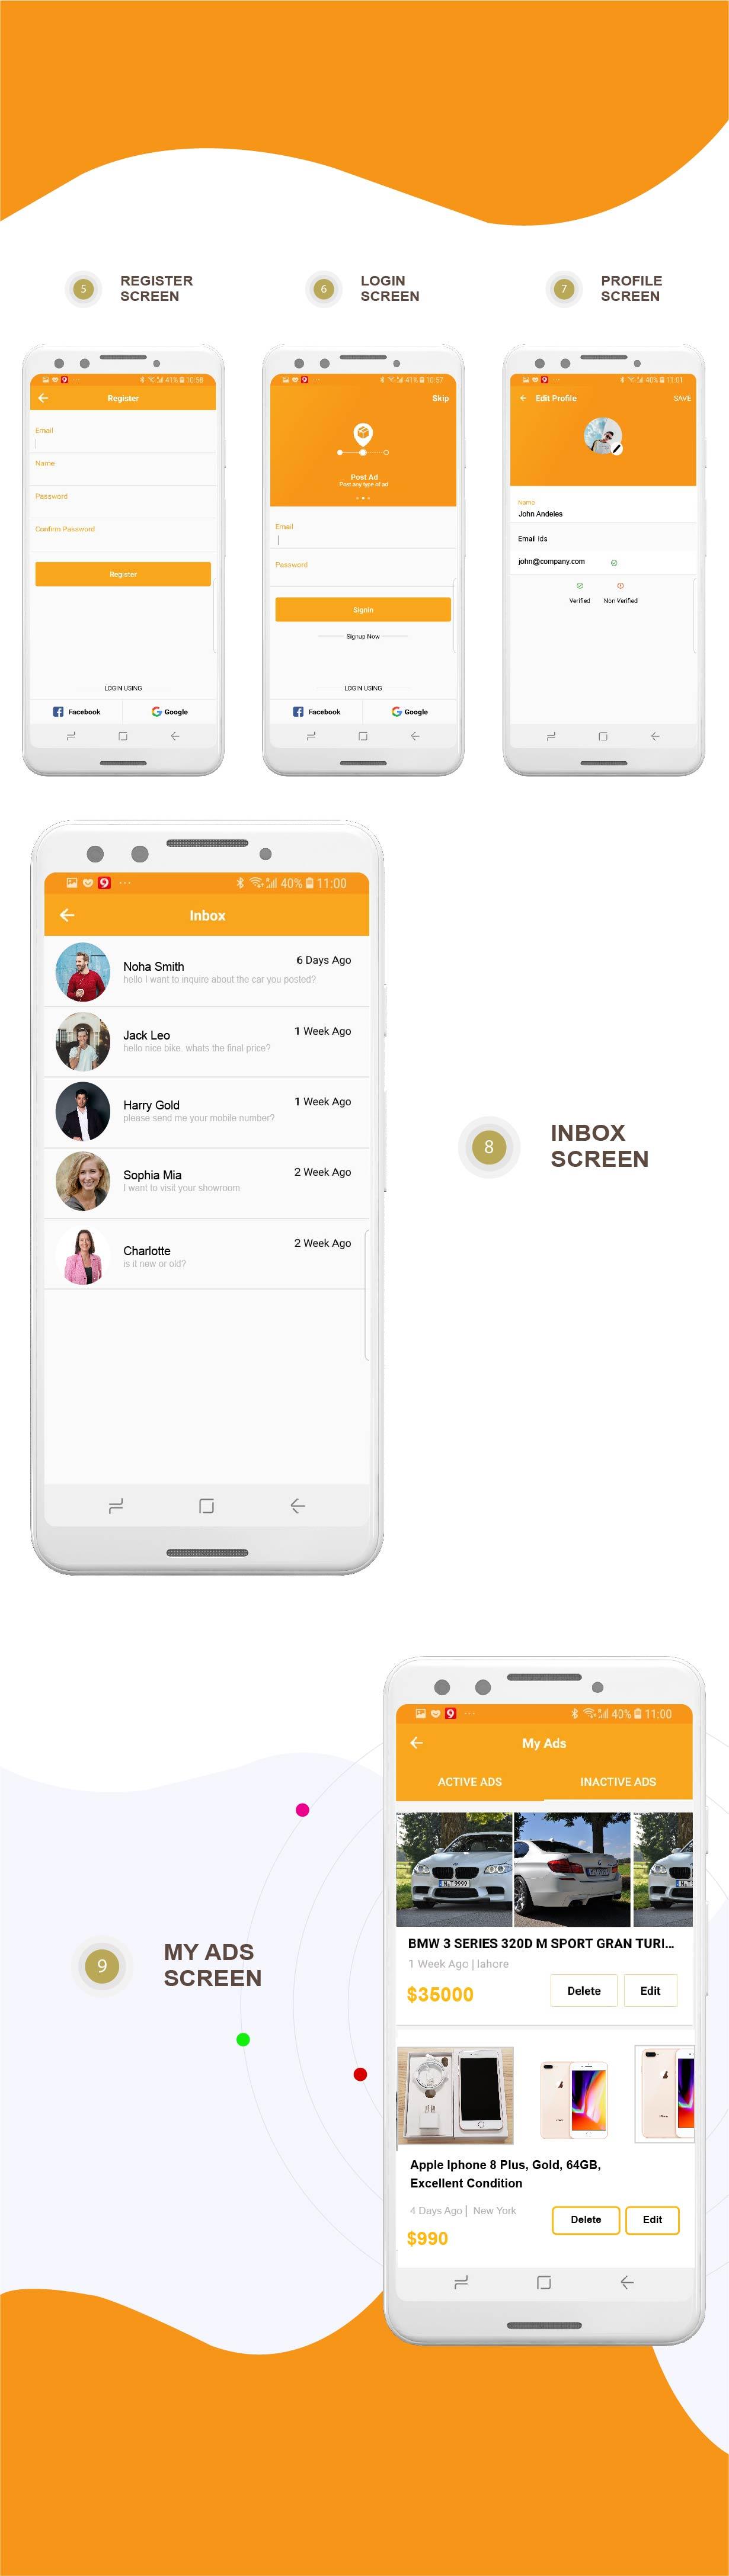 Advilla - Classified Android Native App v1.0.1 - 5